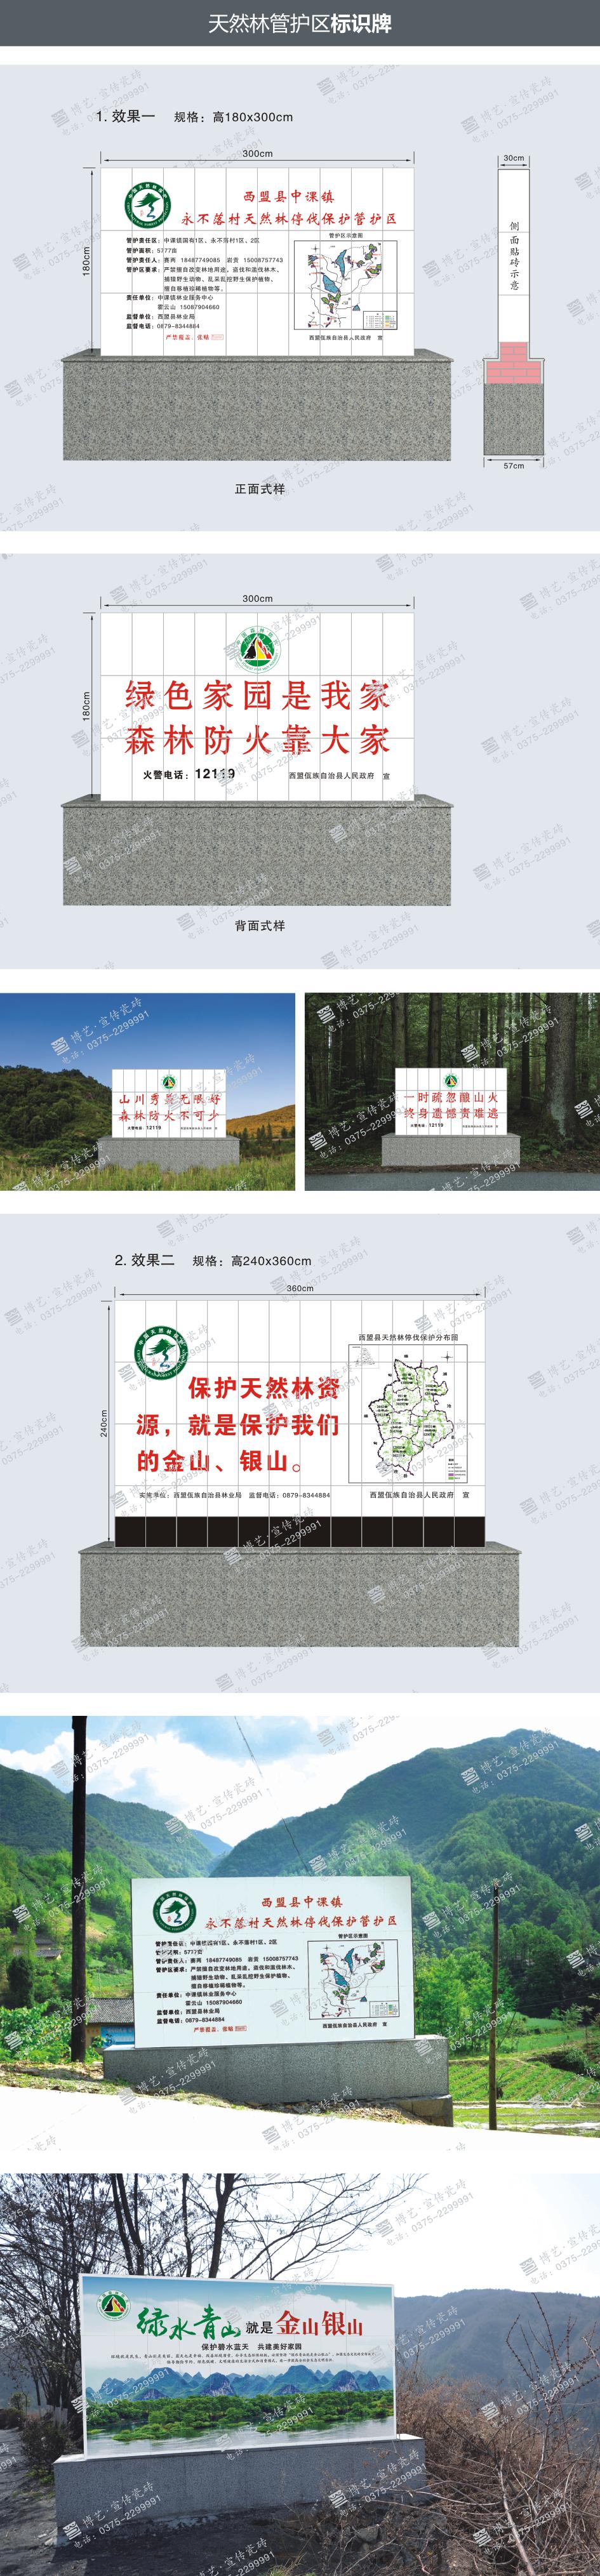 8林业-天然林.png